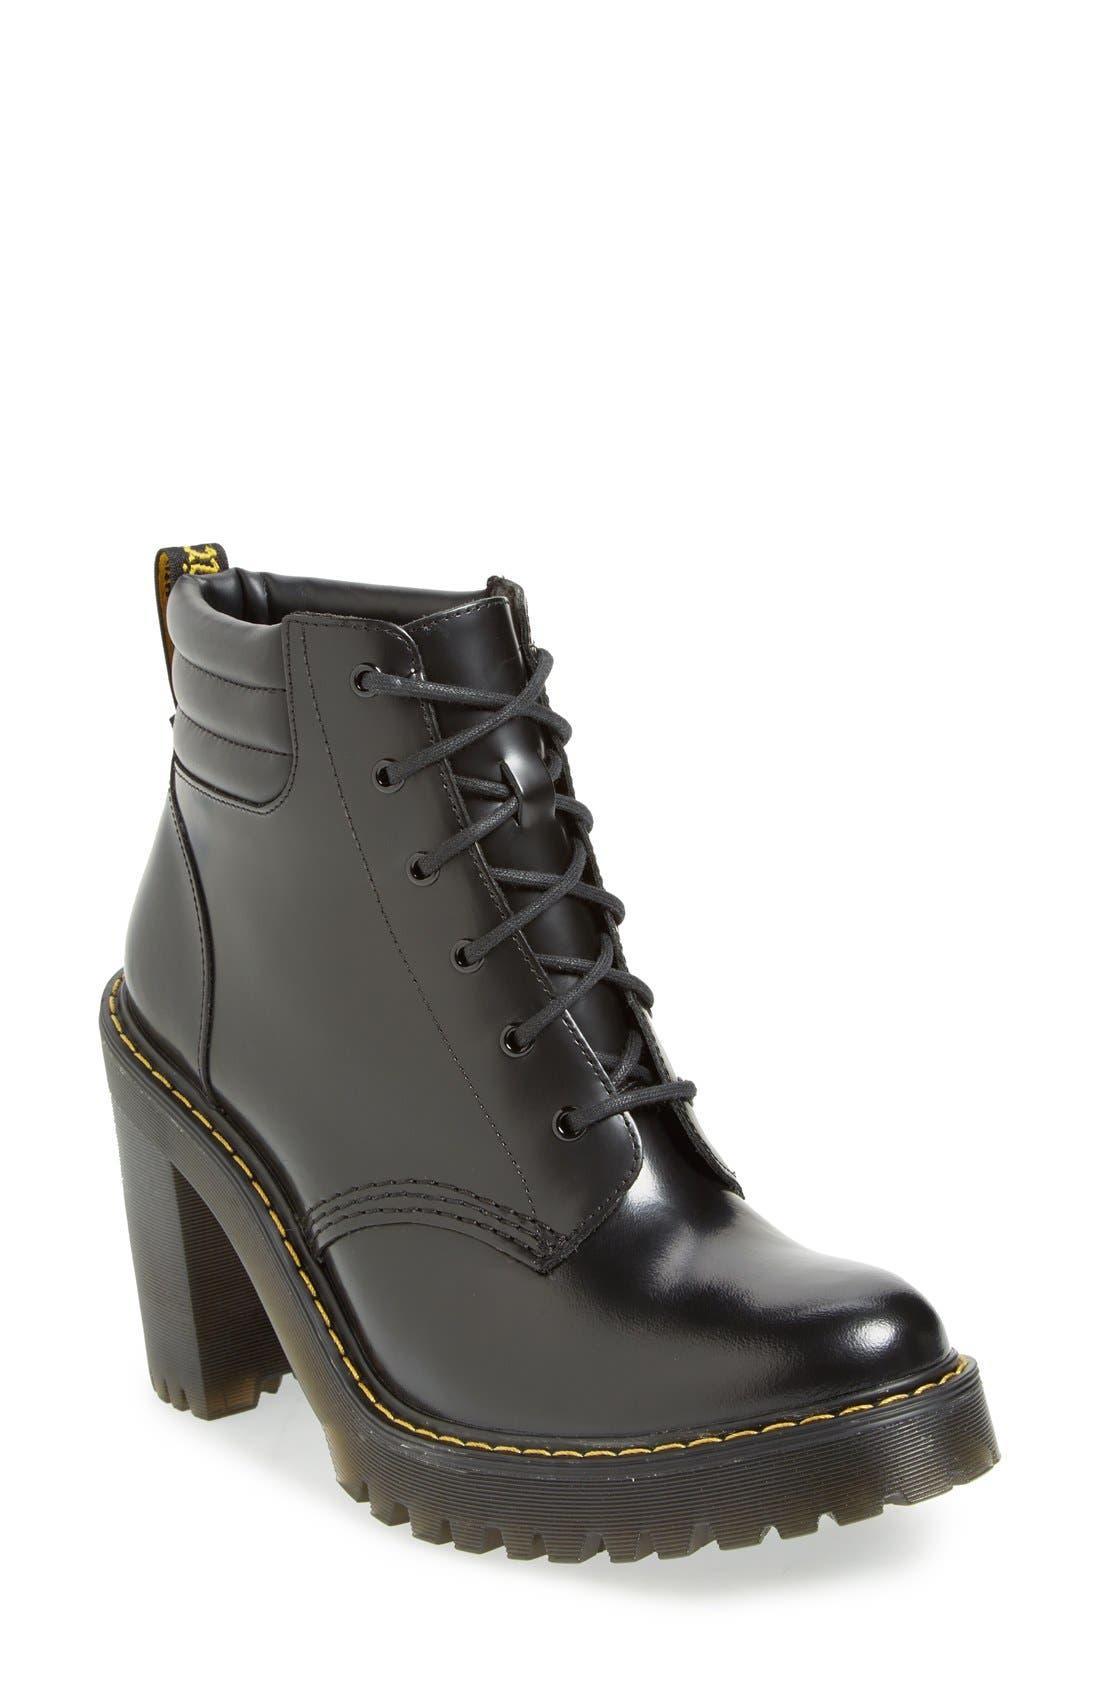 Main Image - Dr. Martens 'Persephone' Platform Boot (Women)